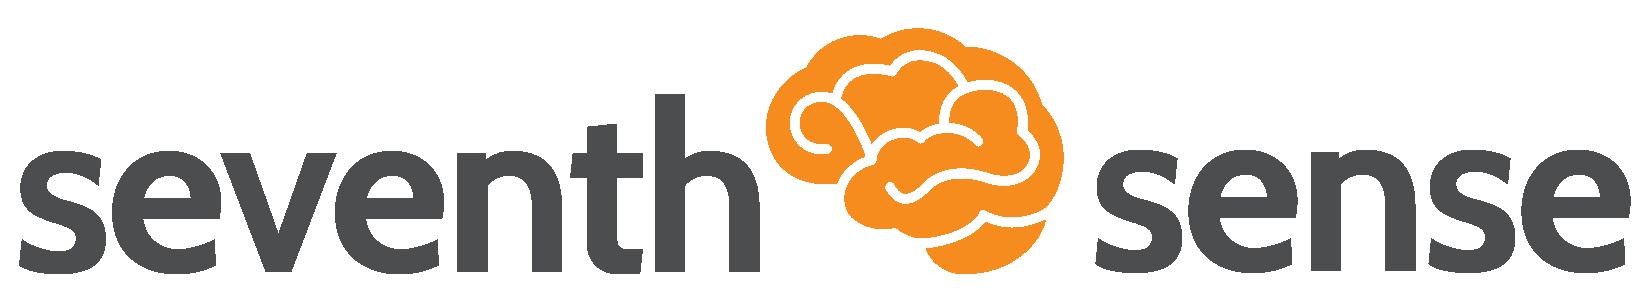 seventh-sense-logo Mar 2018